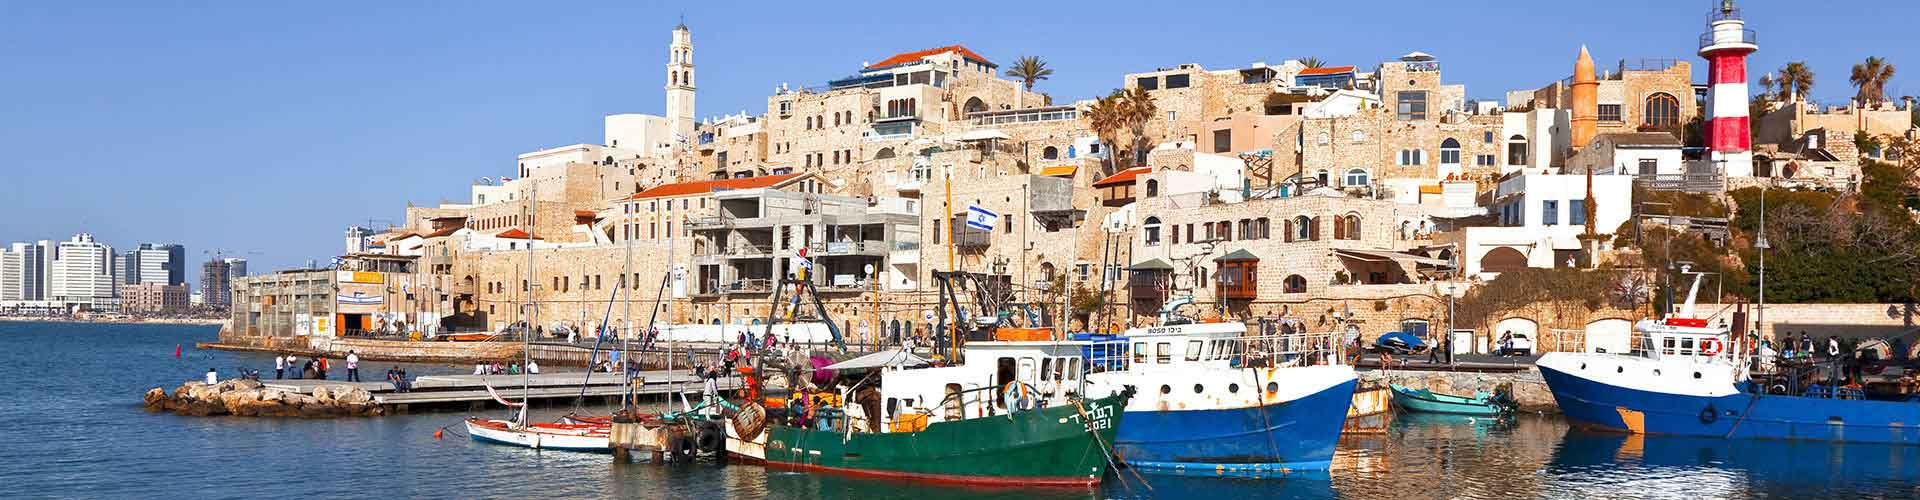 Tel Aviv - Hostelů v Tel Aviv. Mapy pro Tel Aviv, fotky a recenze pro každý hostel v Tel Aviv.